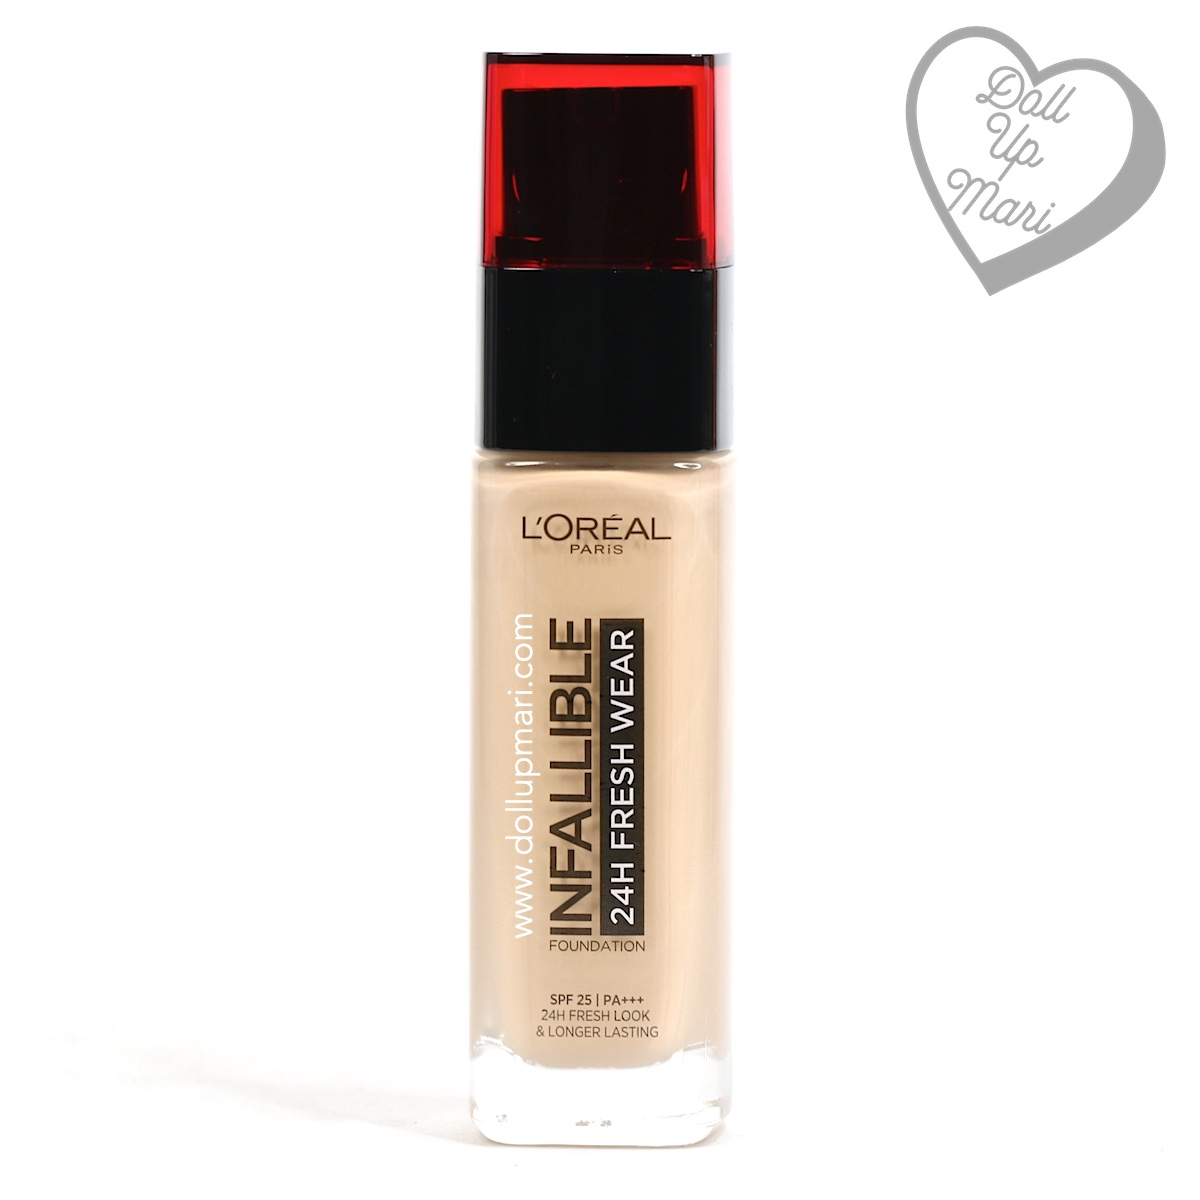 Bottle Front of L'Oréal Paris Infallible 24HR Fresh Wear Liquid Foundation SPF25PA+++ in shade Golden Beige